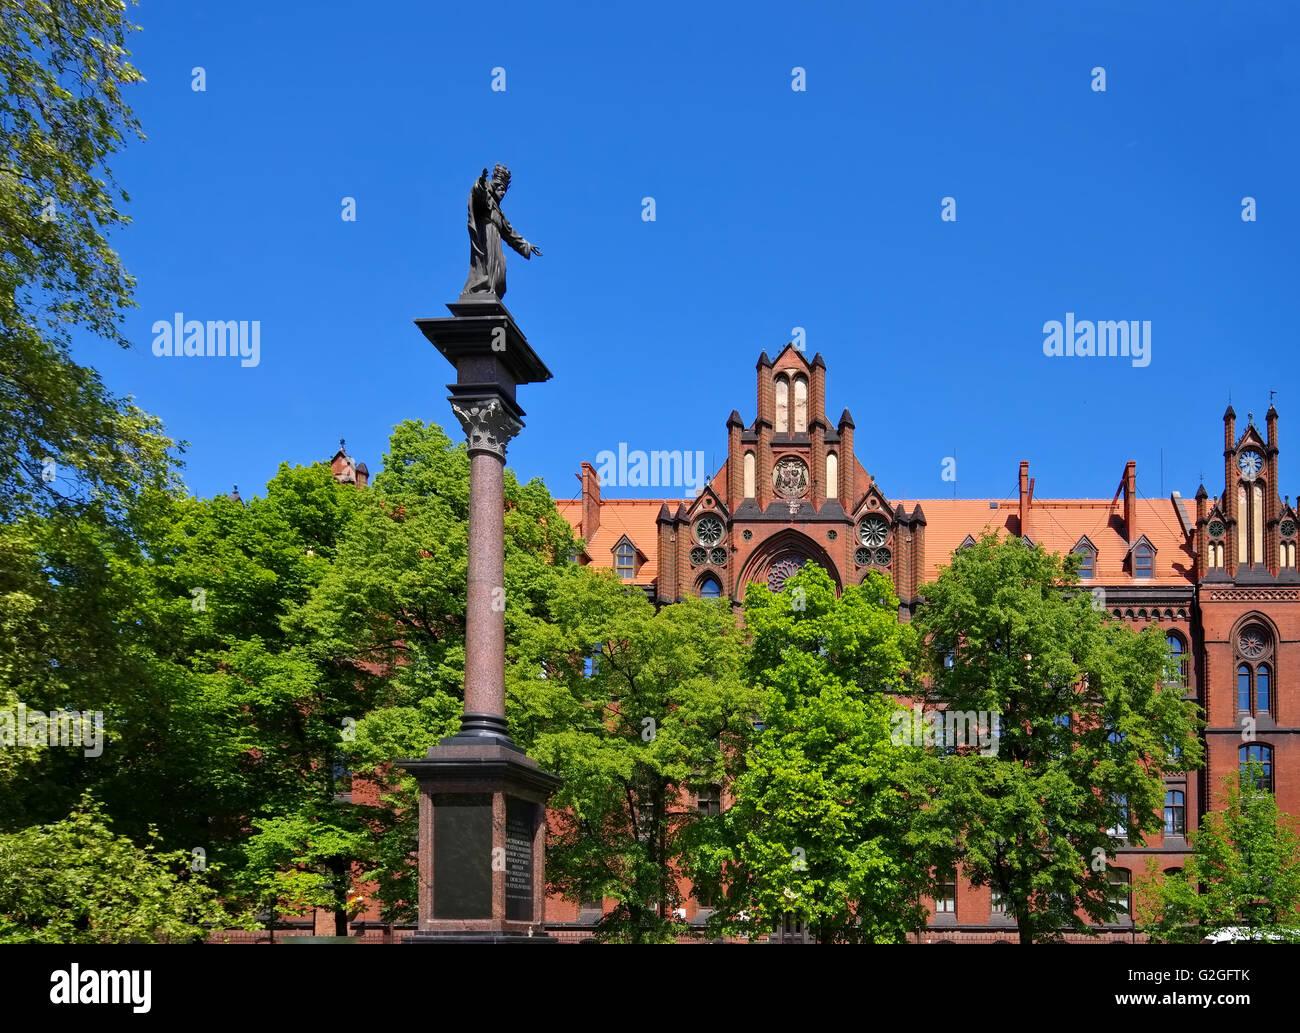 Breslau Seminarium Duchowne und Denkmal - Breslau Seminarium Duchowne and monument - Stock Image